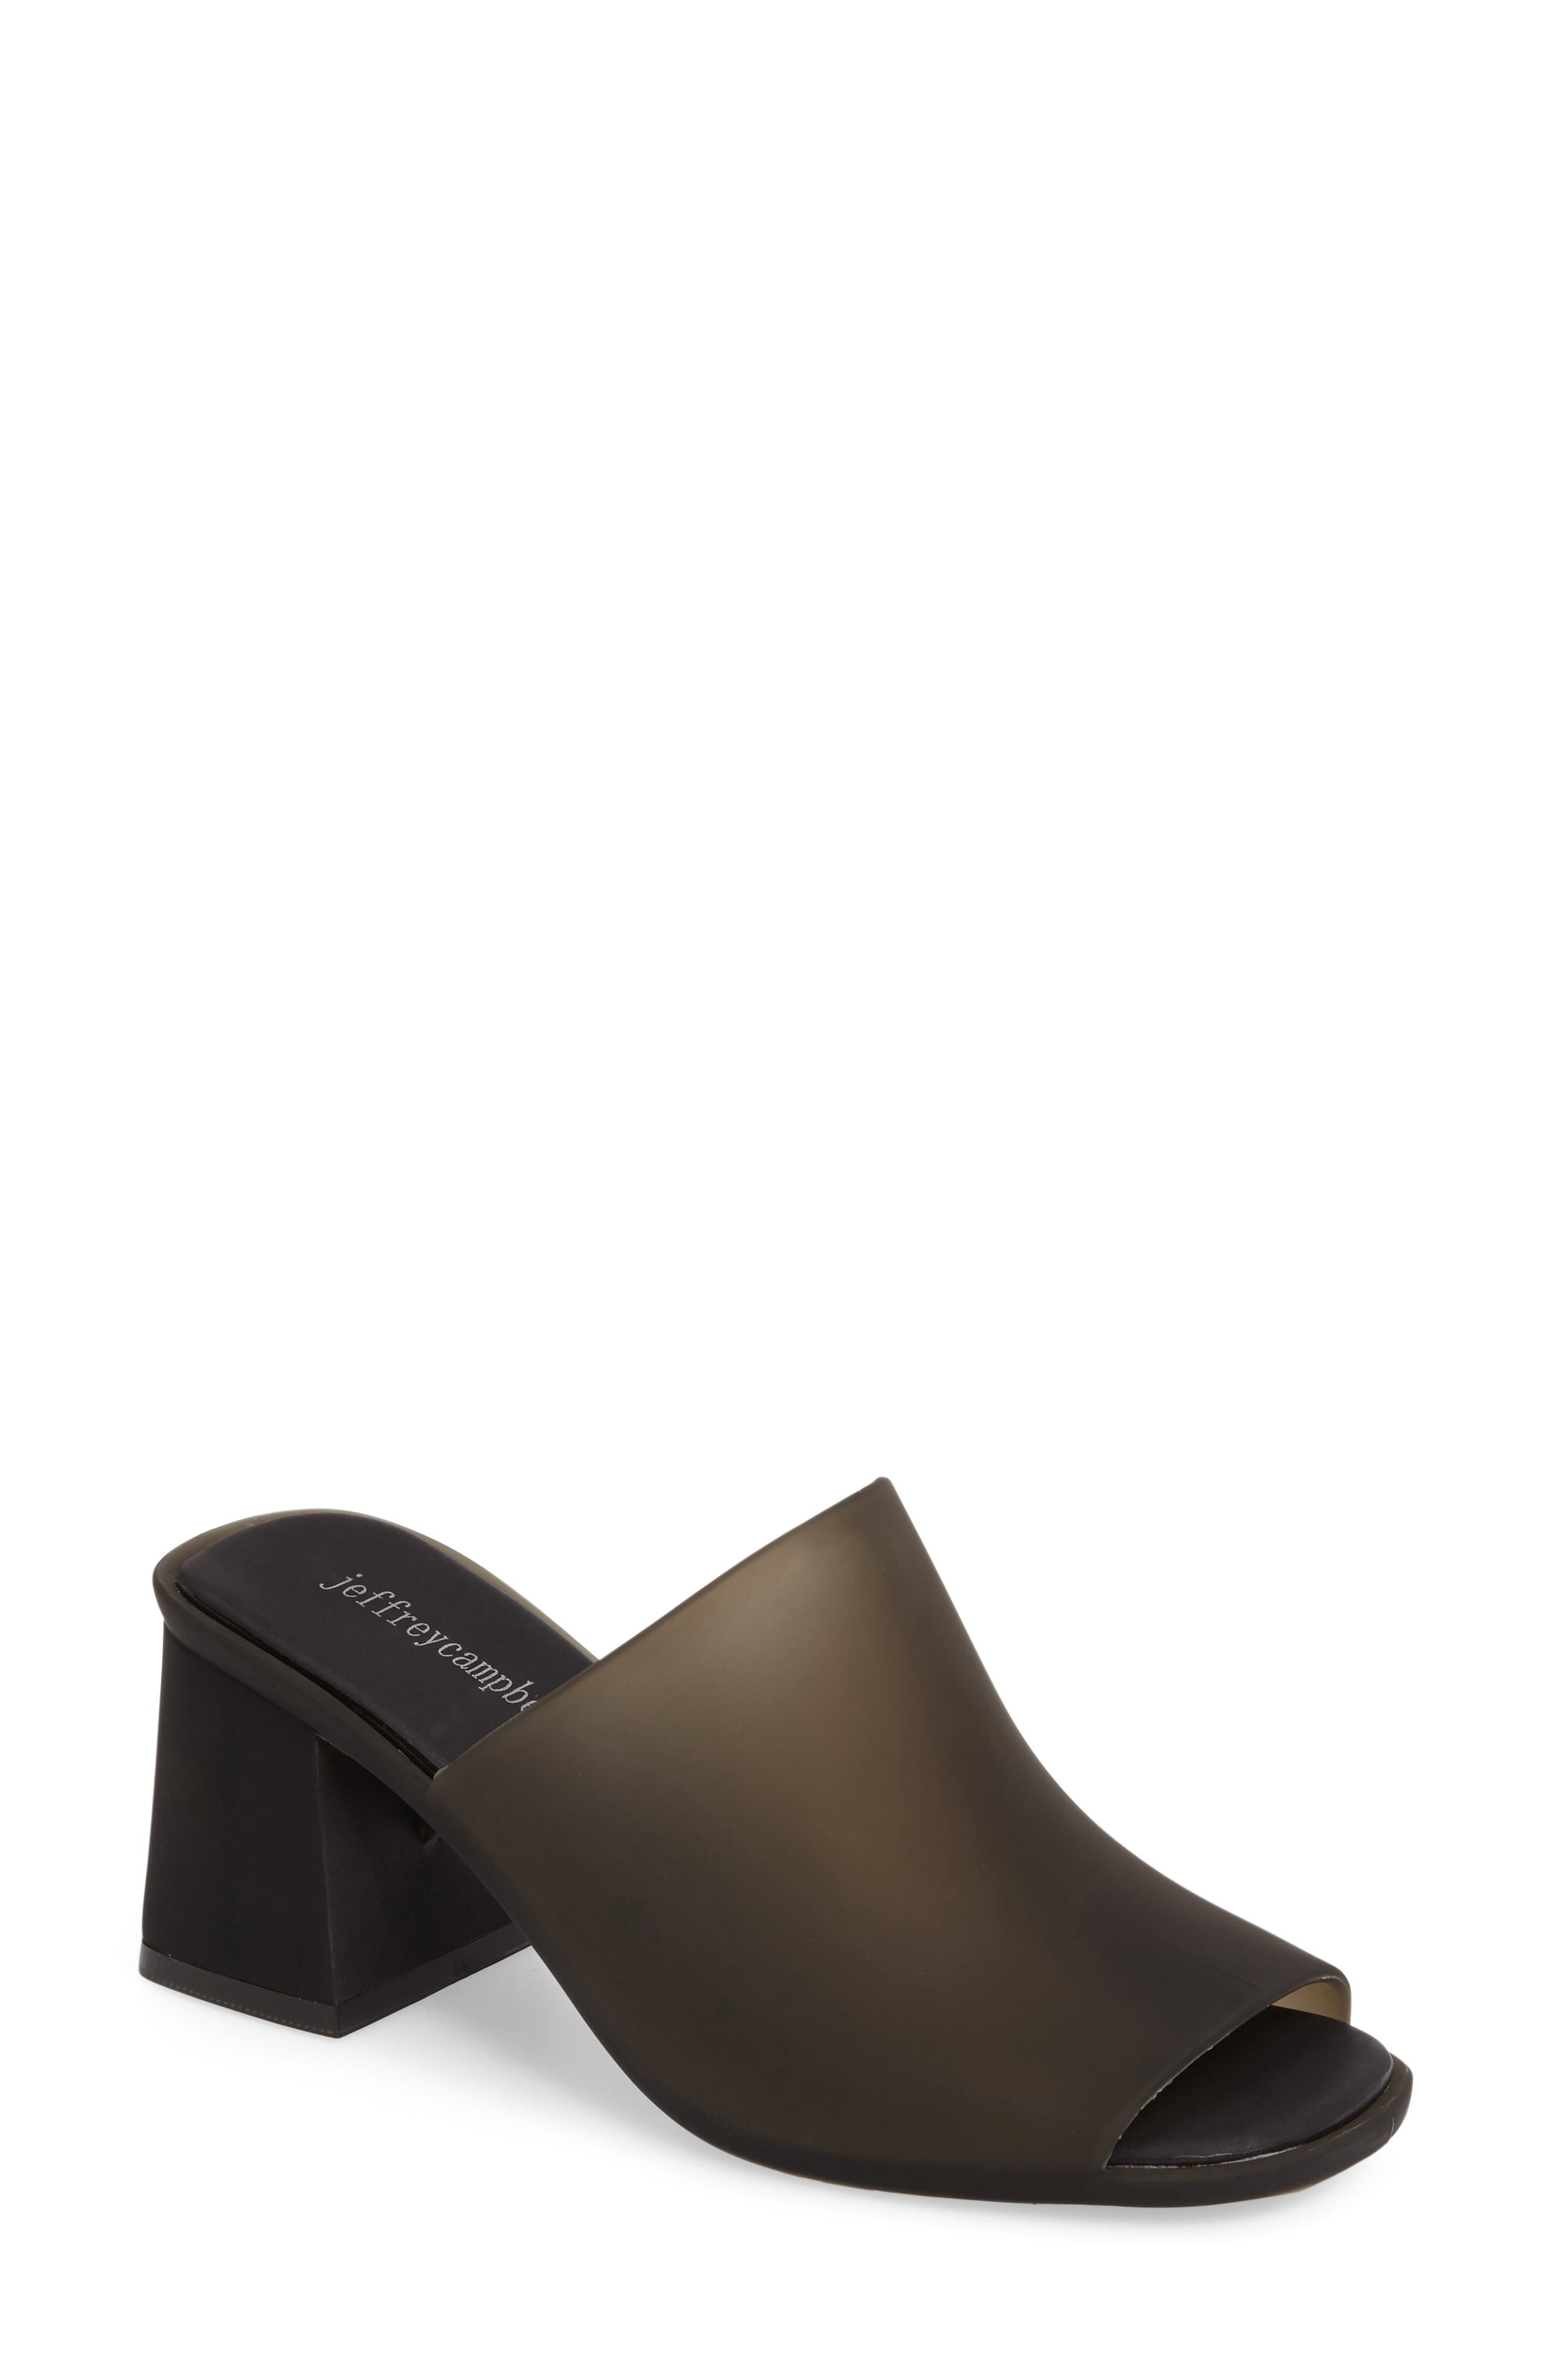 Jelly Slide Sandal,                             Main thumbnail 1, color,                             001